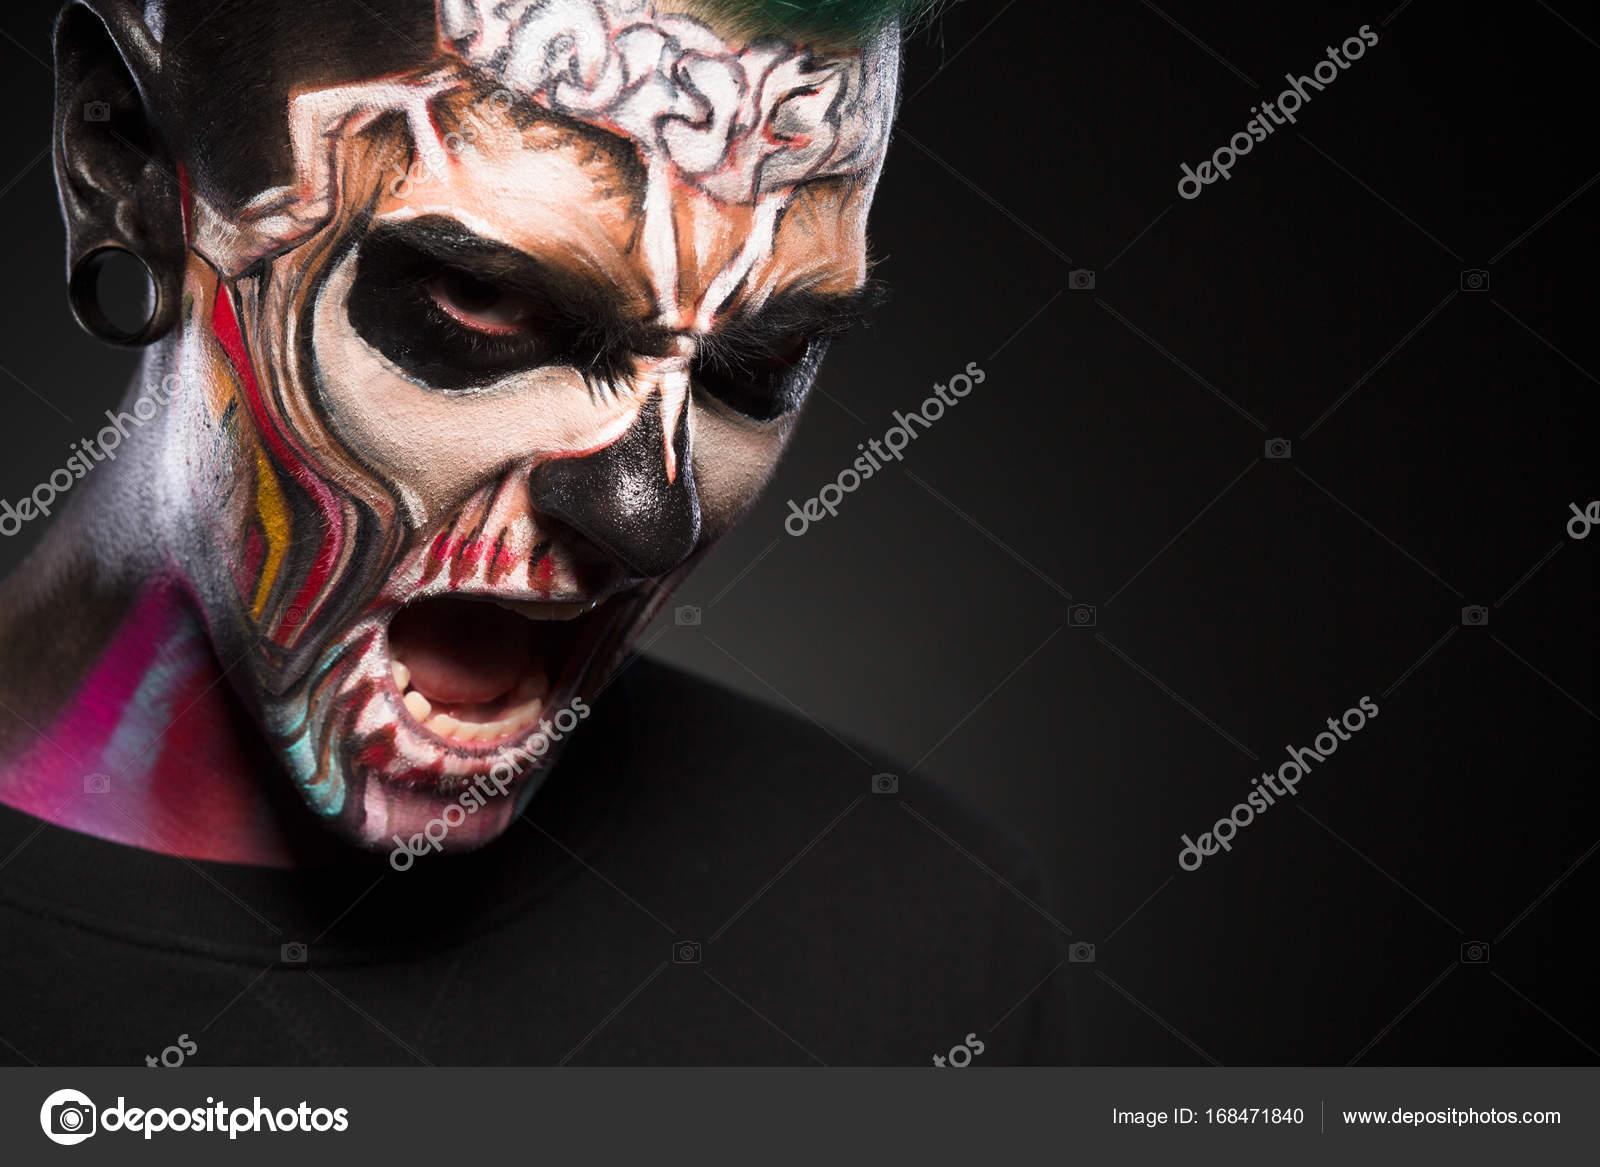 Maquillaje De Monstruo Hombre Con Cara De Zombie Retrato De - Maquillaje-zombie-hombre